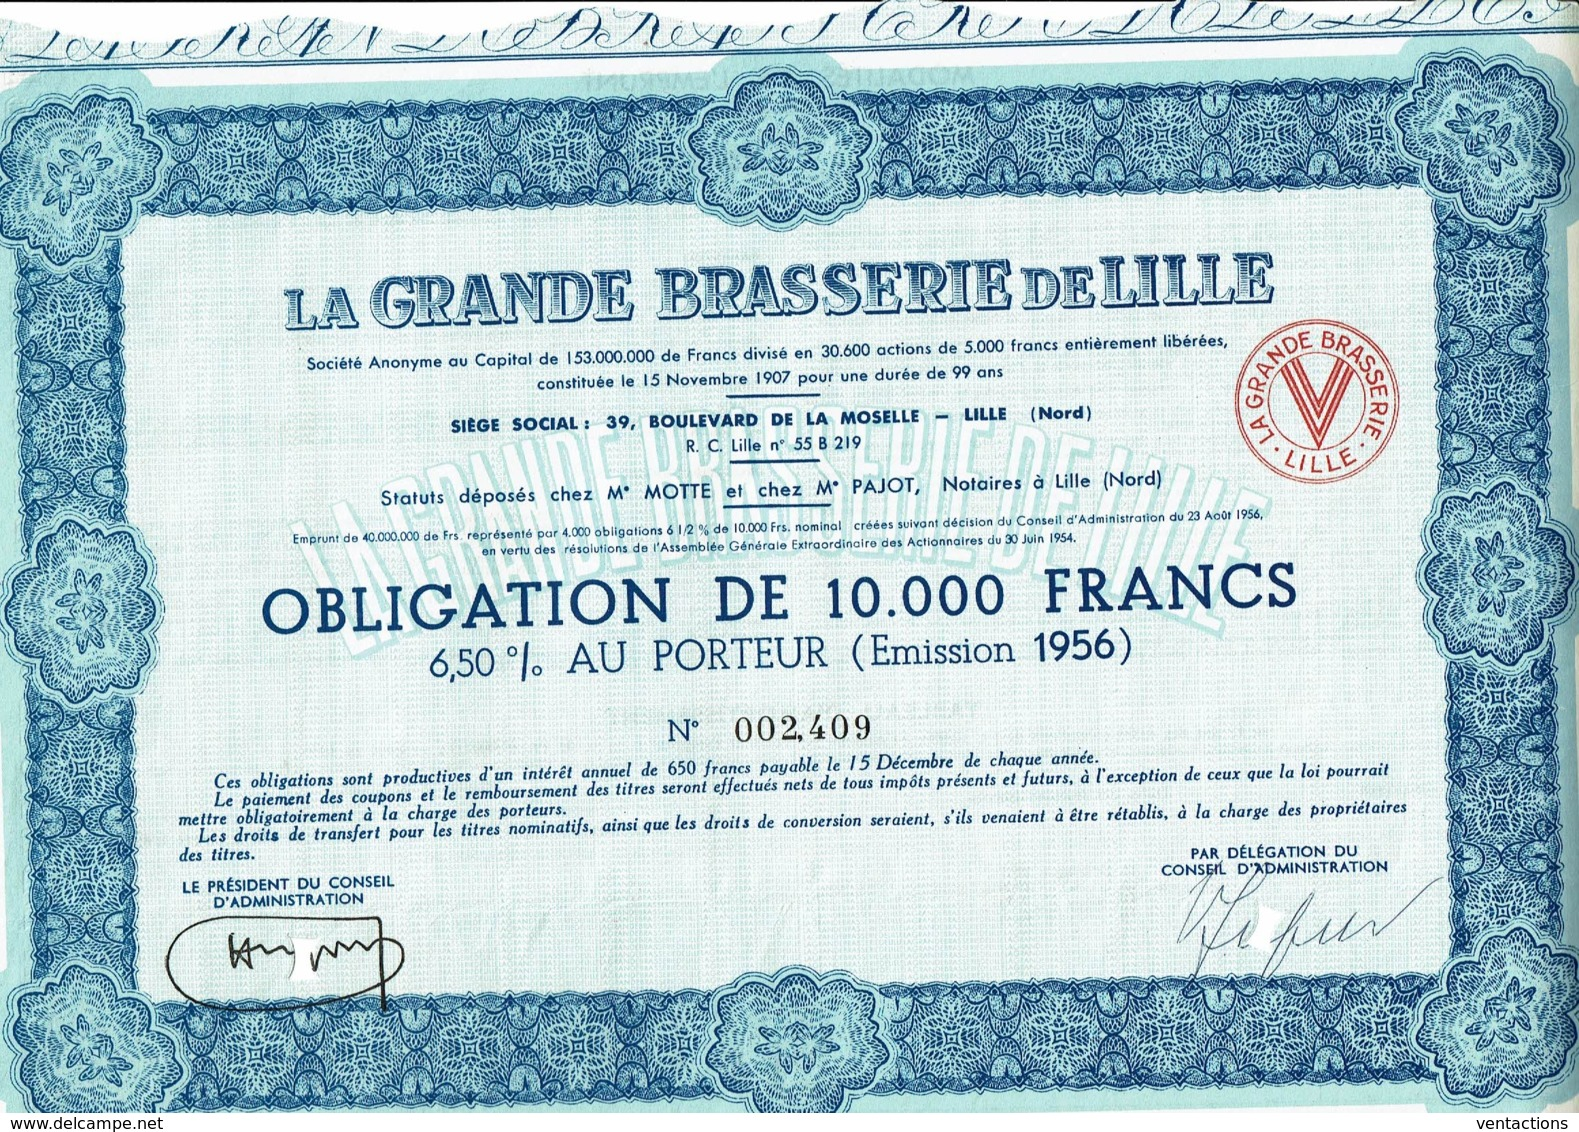 59-BRASSERIE DE LILLE. LA GRANDE ...Oblig 1956 - Other